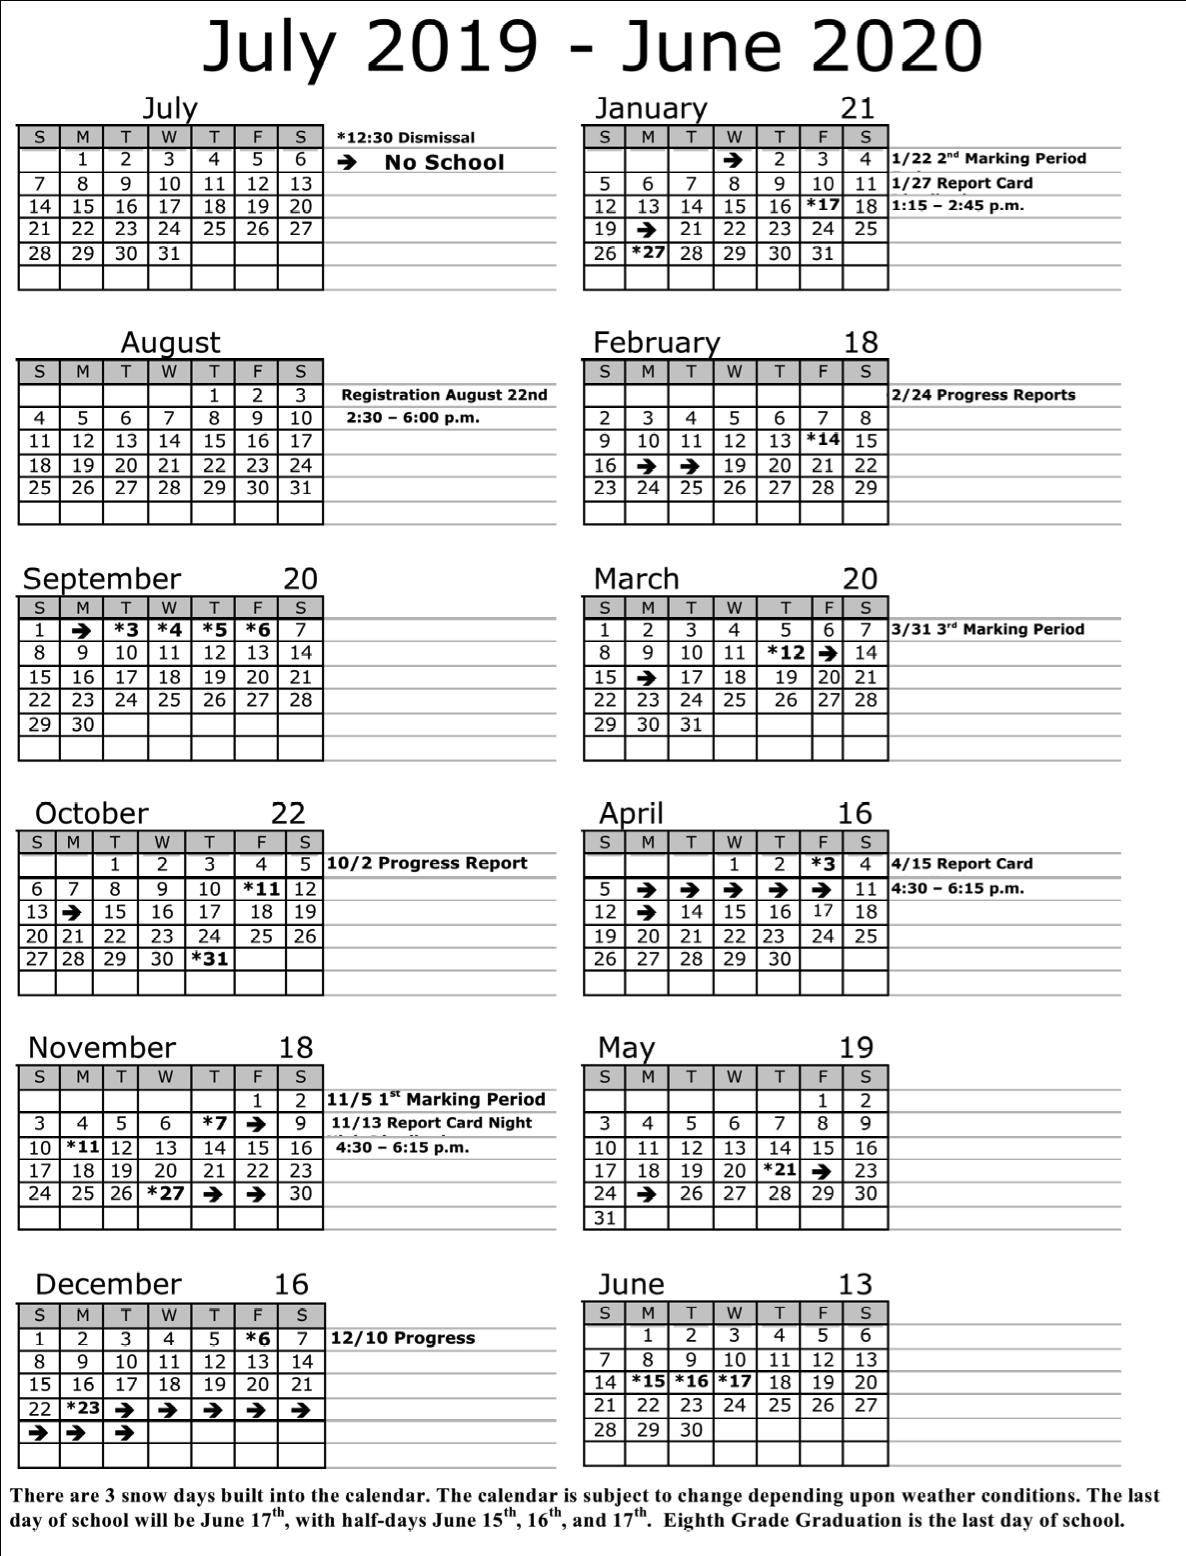 Jersey City Board Of Education Member Calendar   Printable Calendar 2020-2021 intended for Calendar Department Of Education